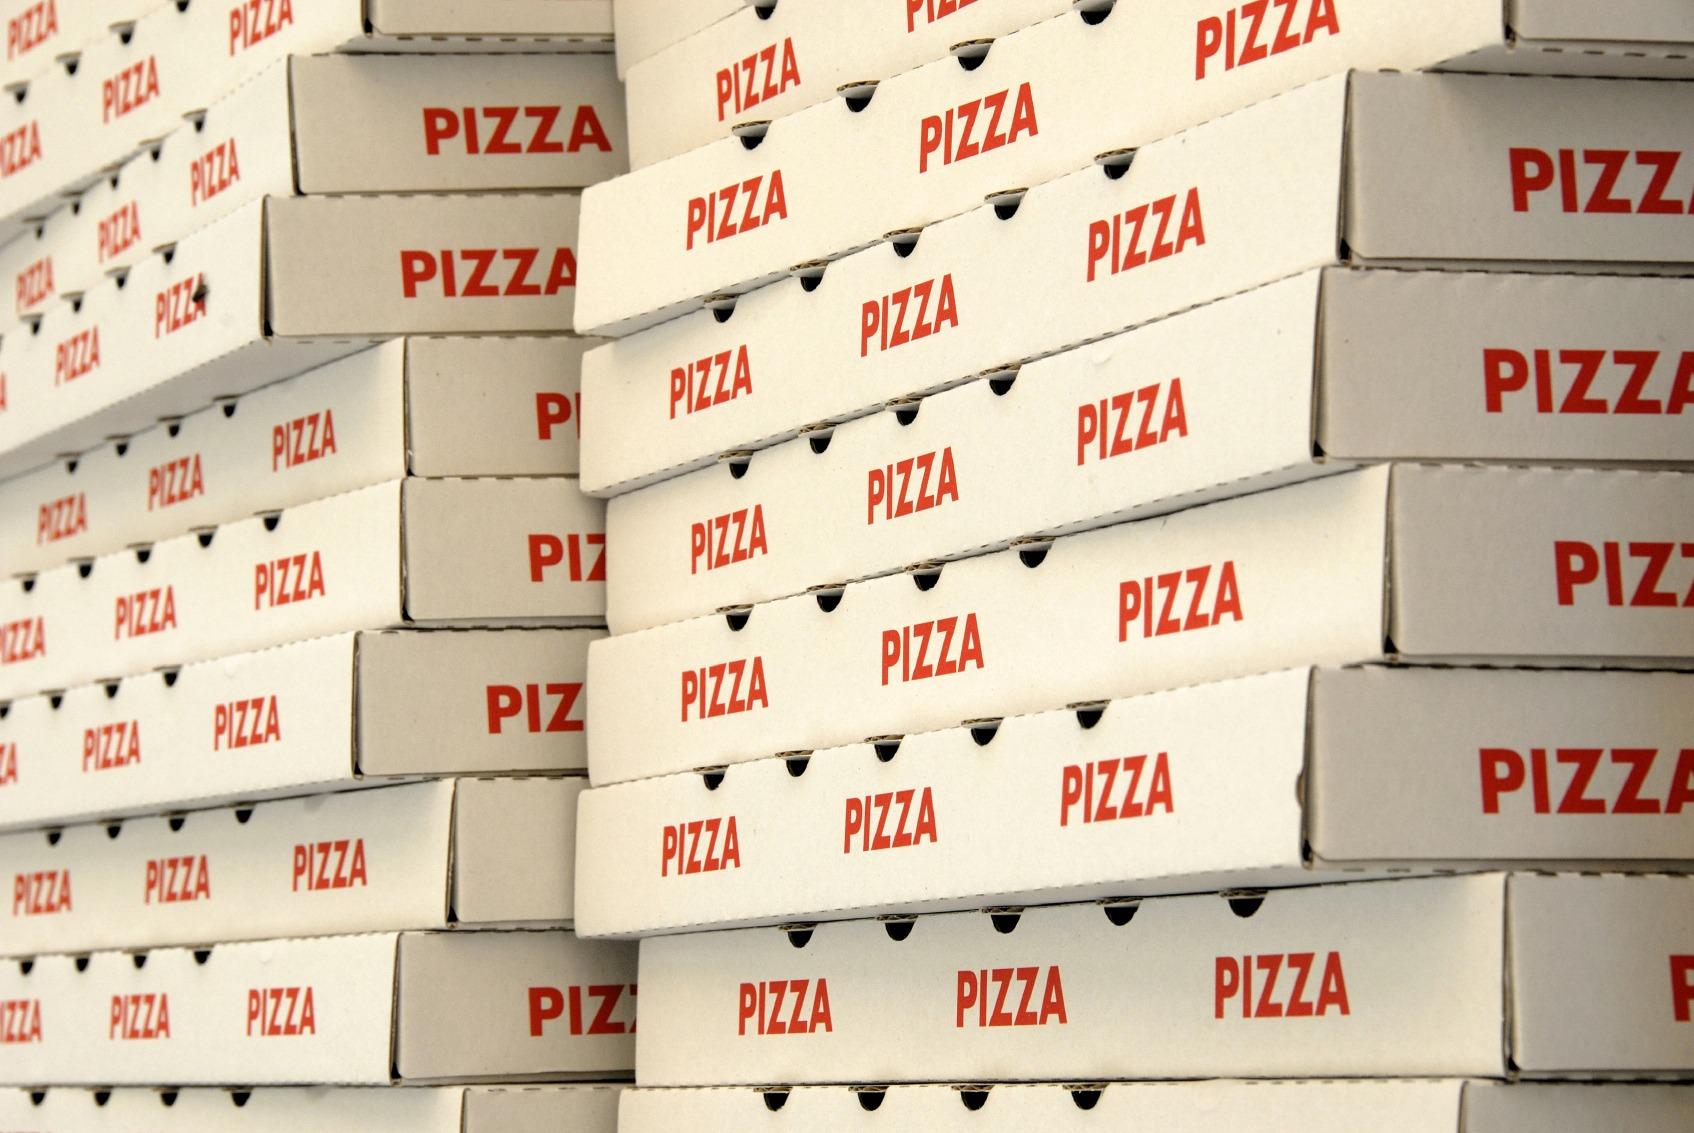 Pizza Box Innovation